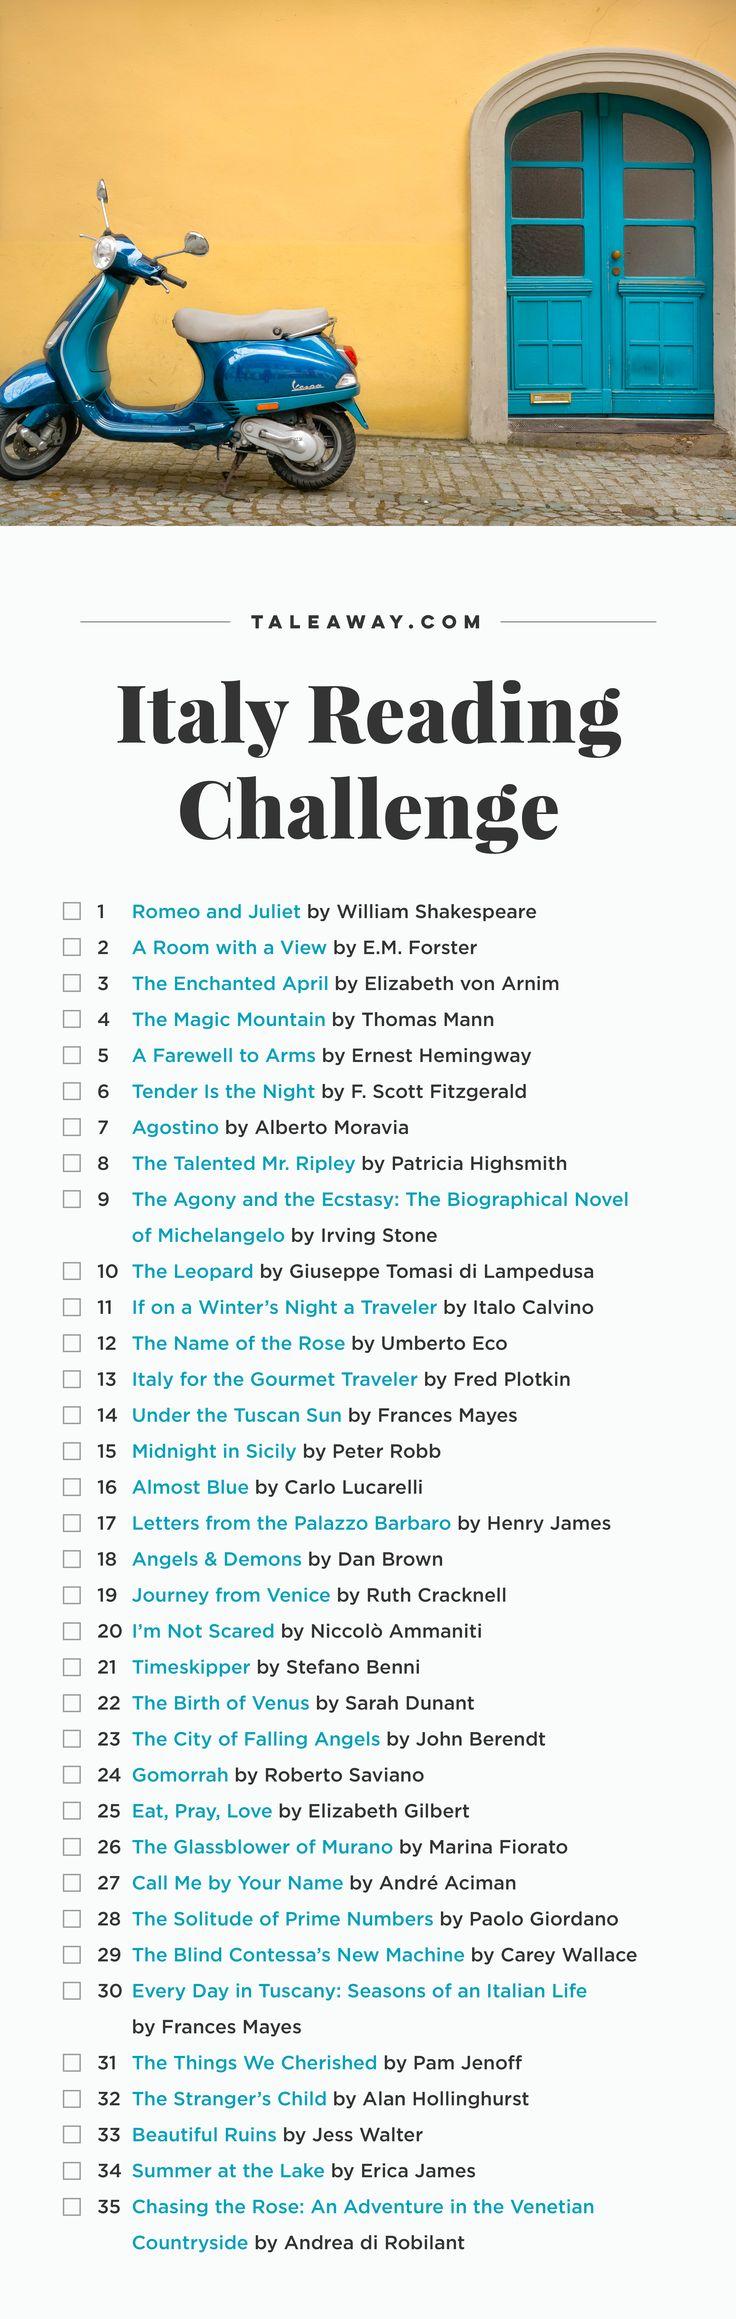 Italy Reading Challenge